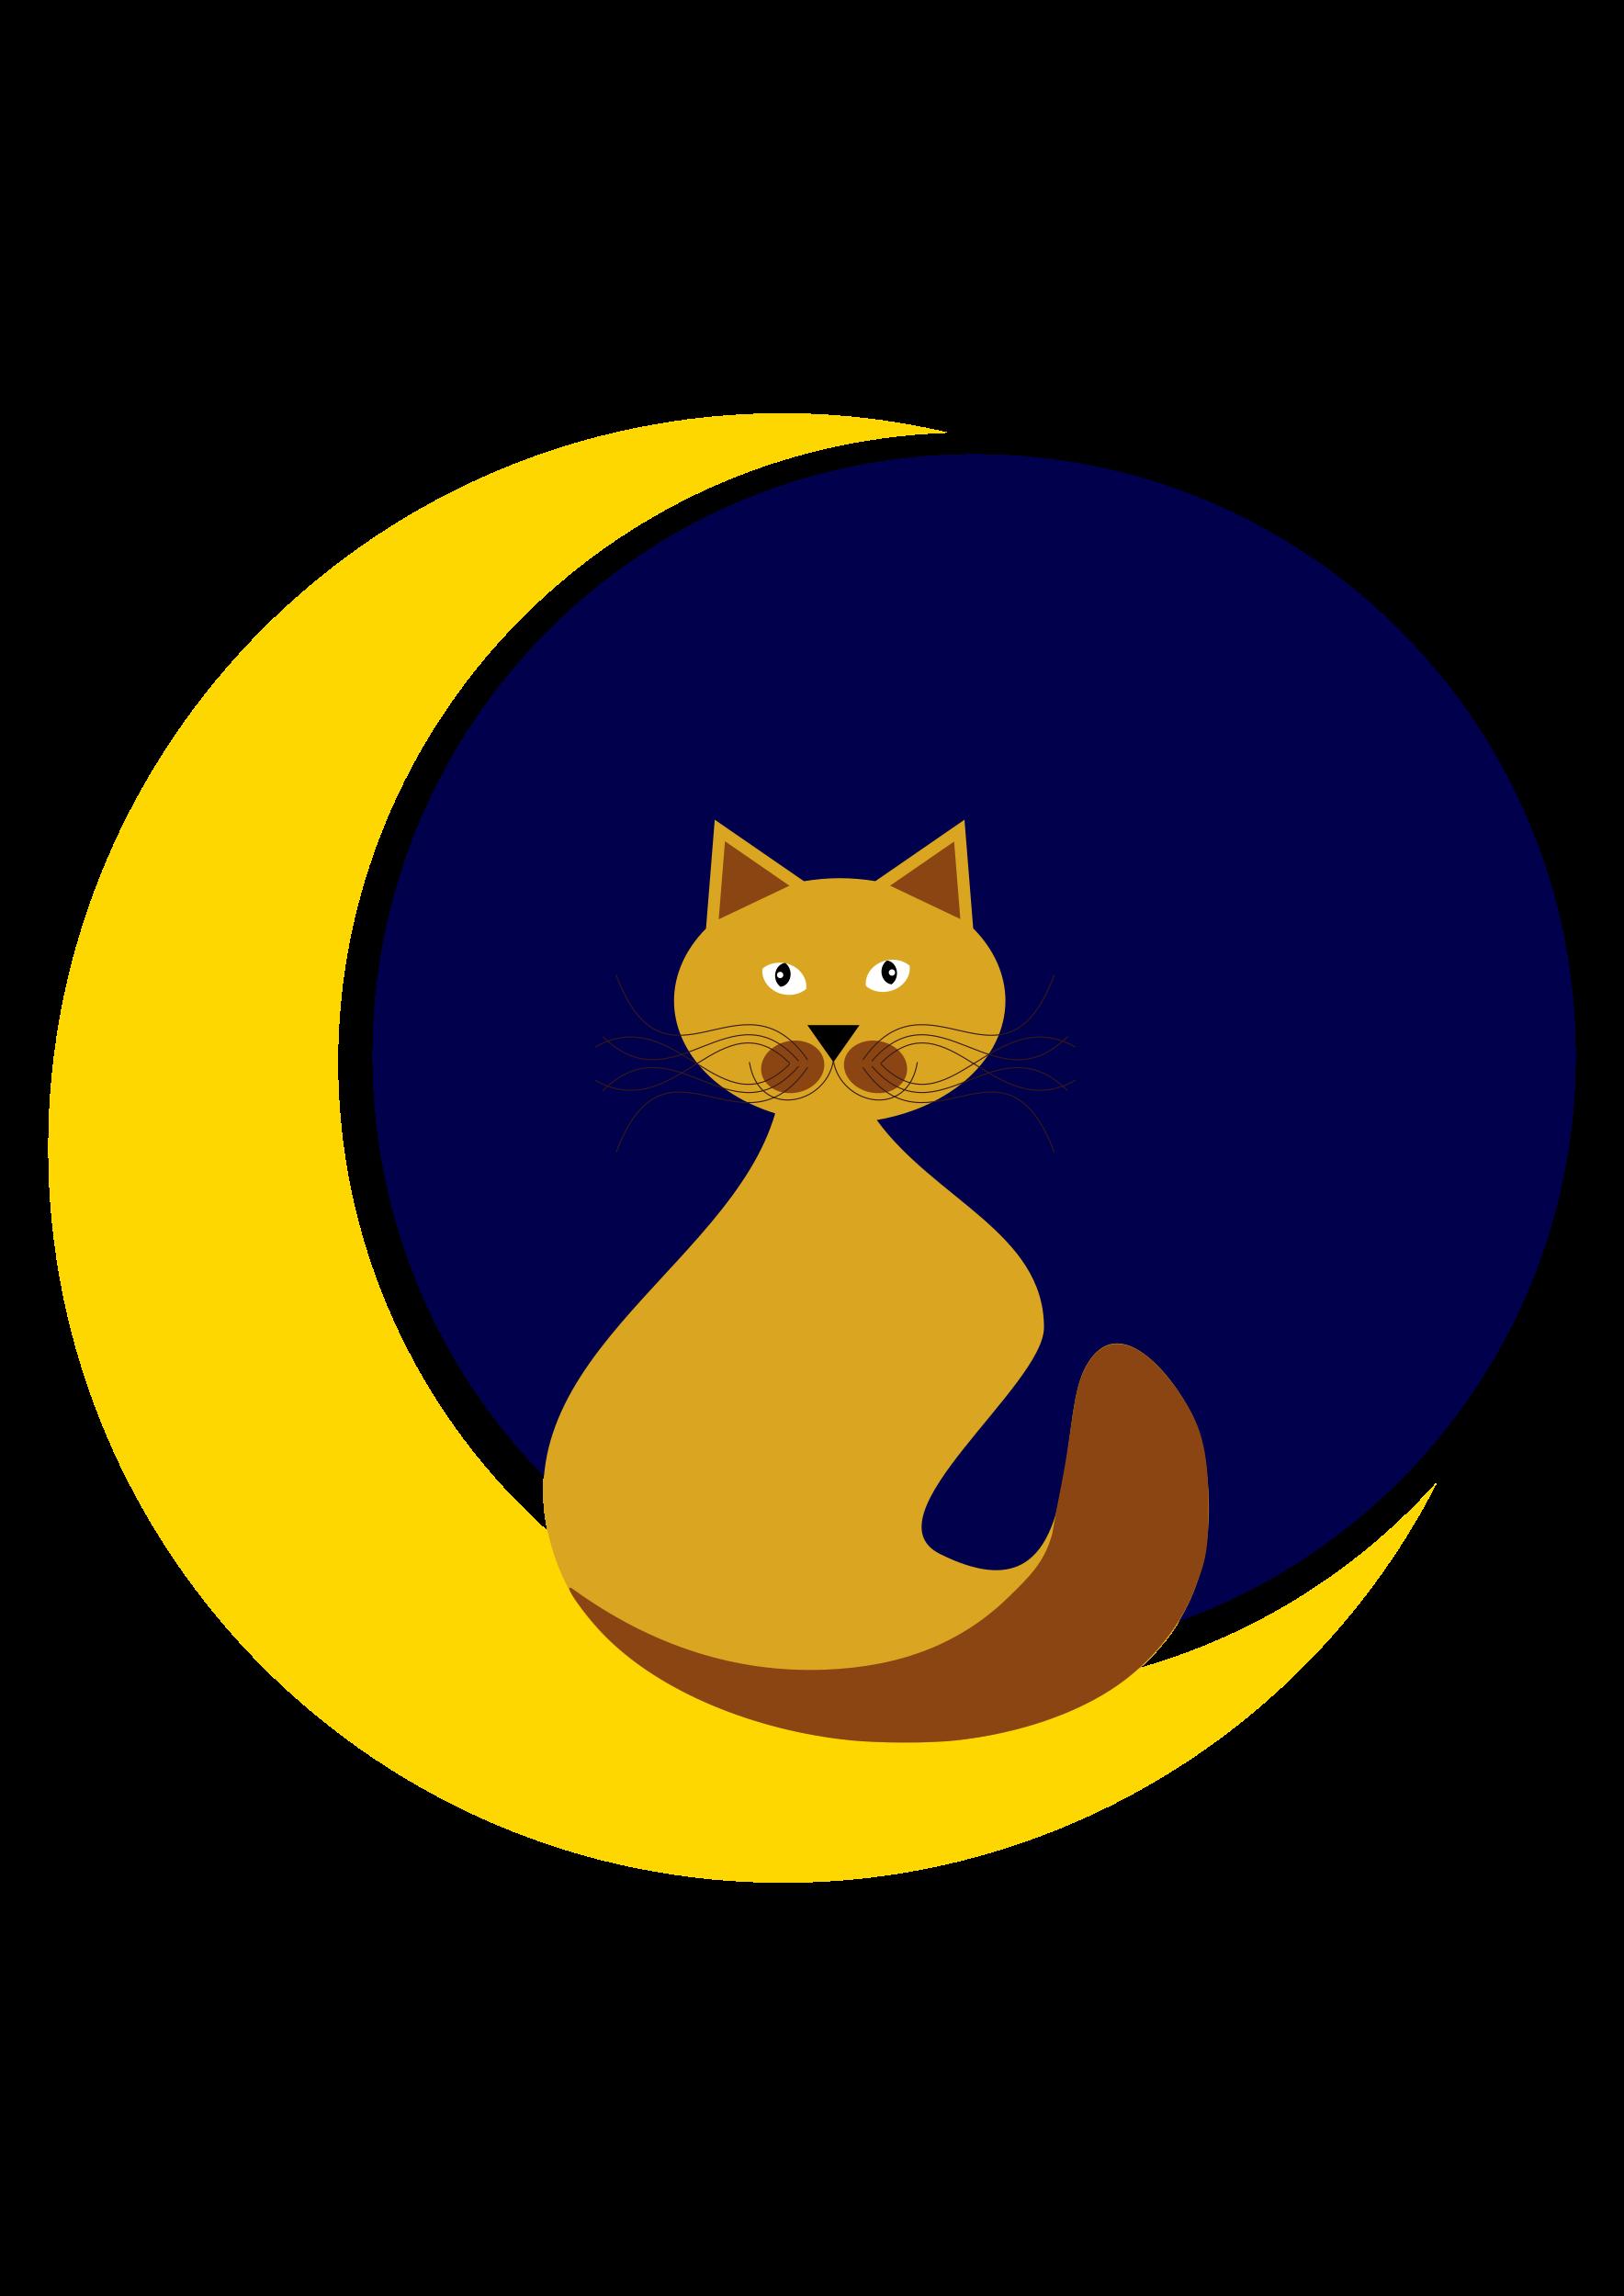 clipart moon bitmap